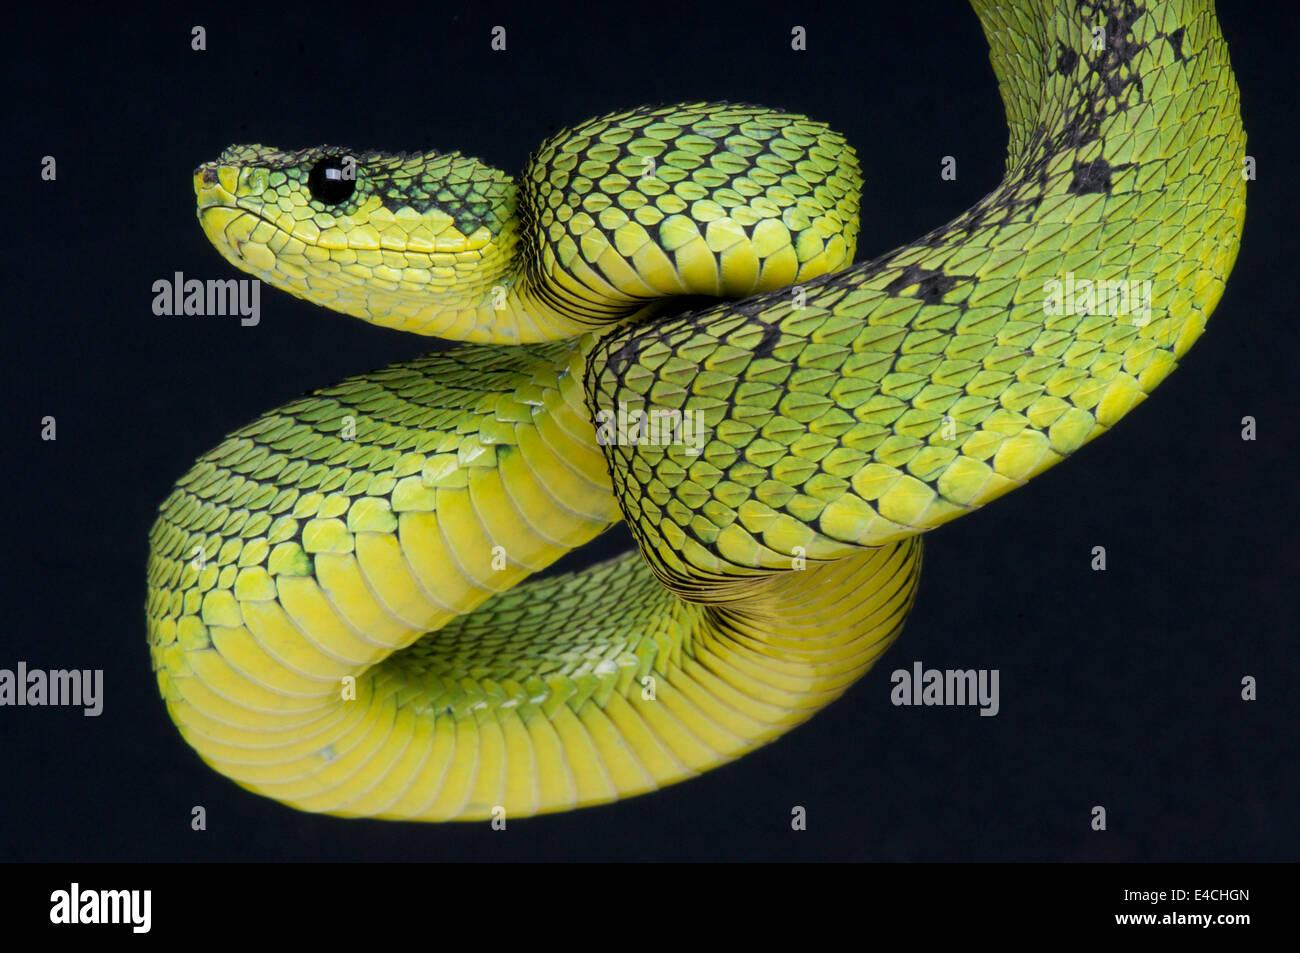 Grandi laghi bush viper / Atheris nitschei Immagini Stock